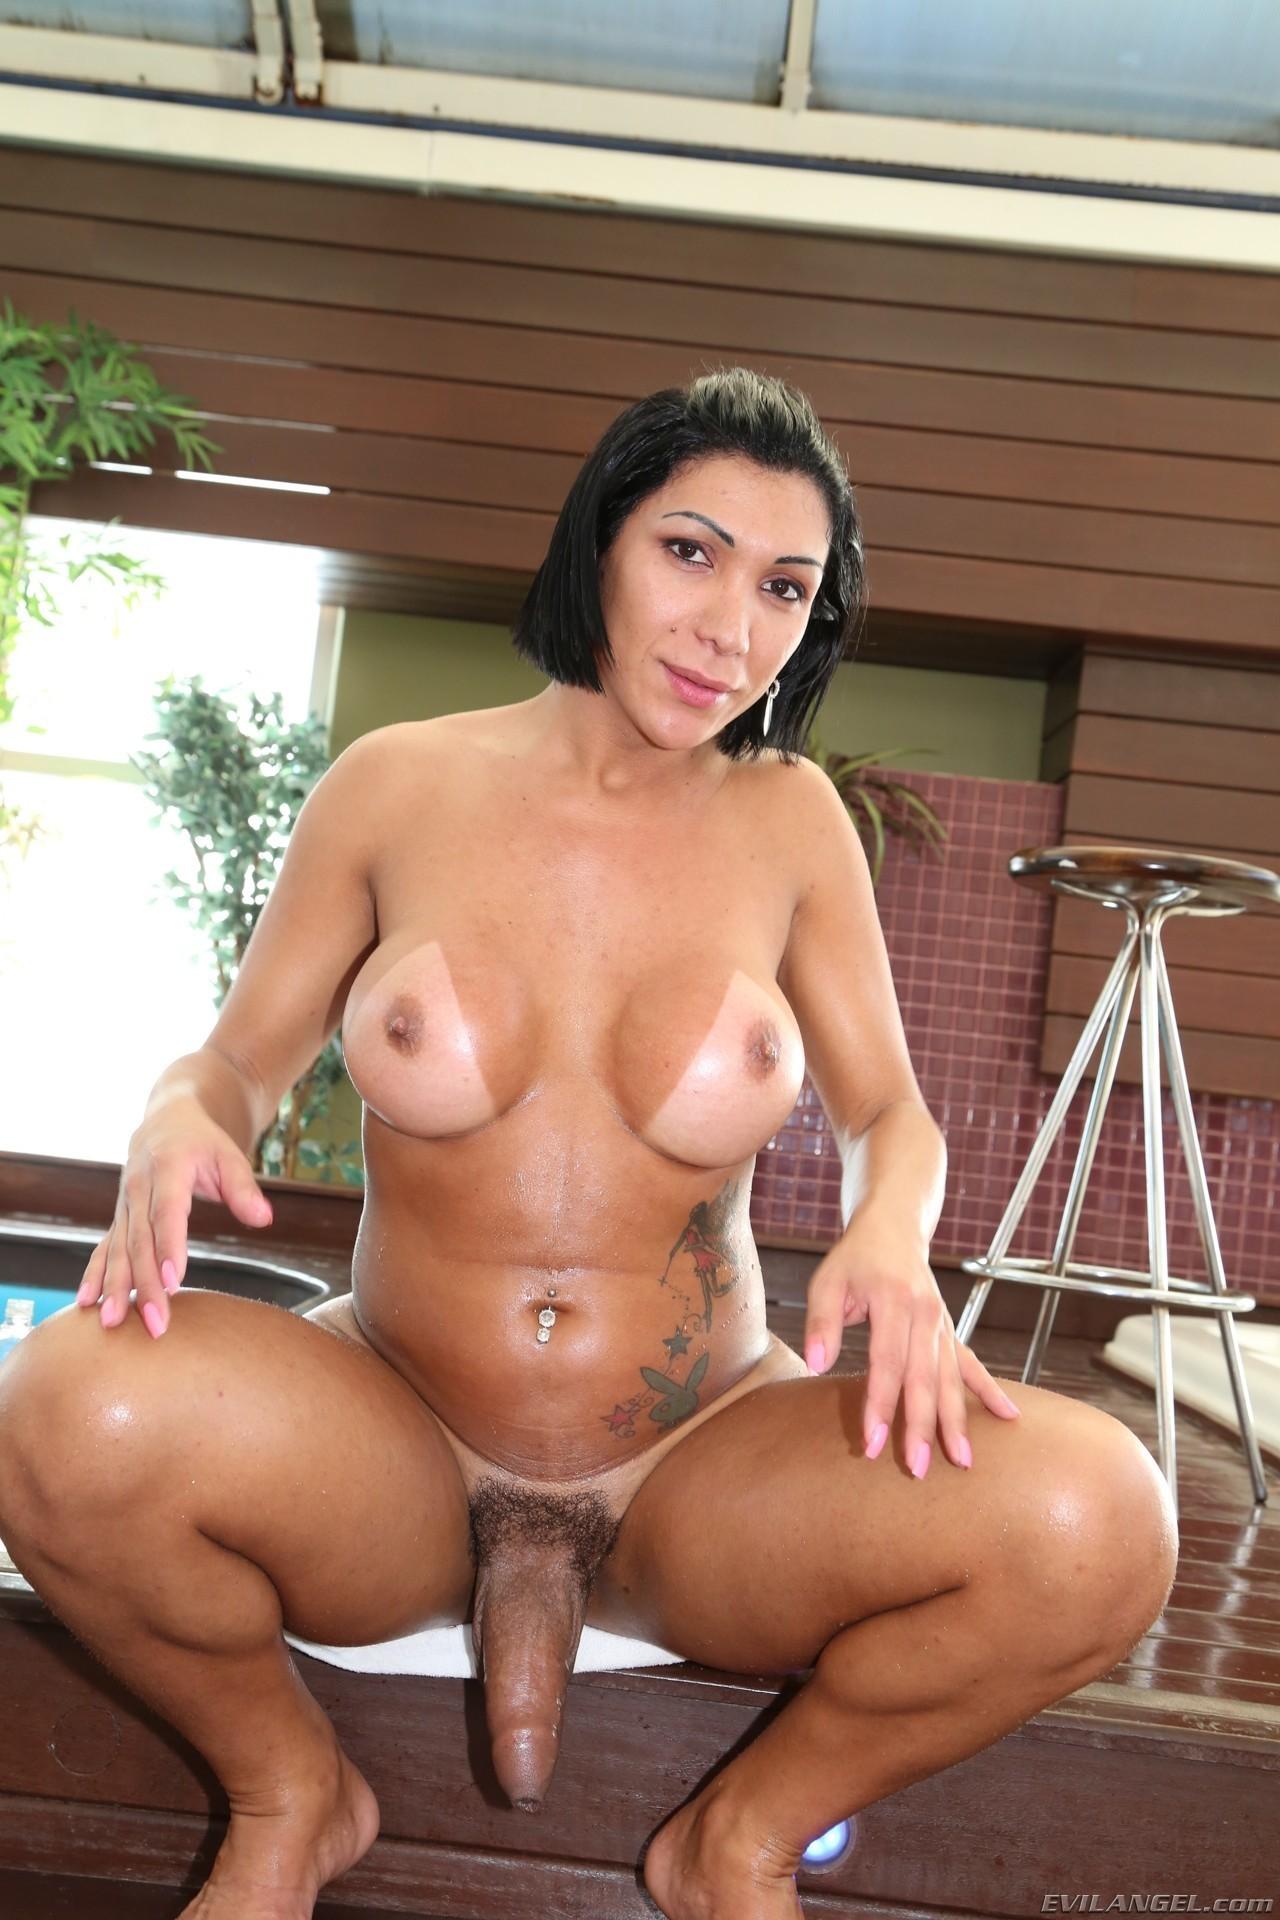 Daphne greengrass nude